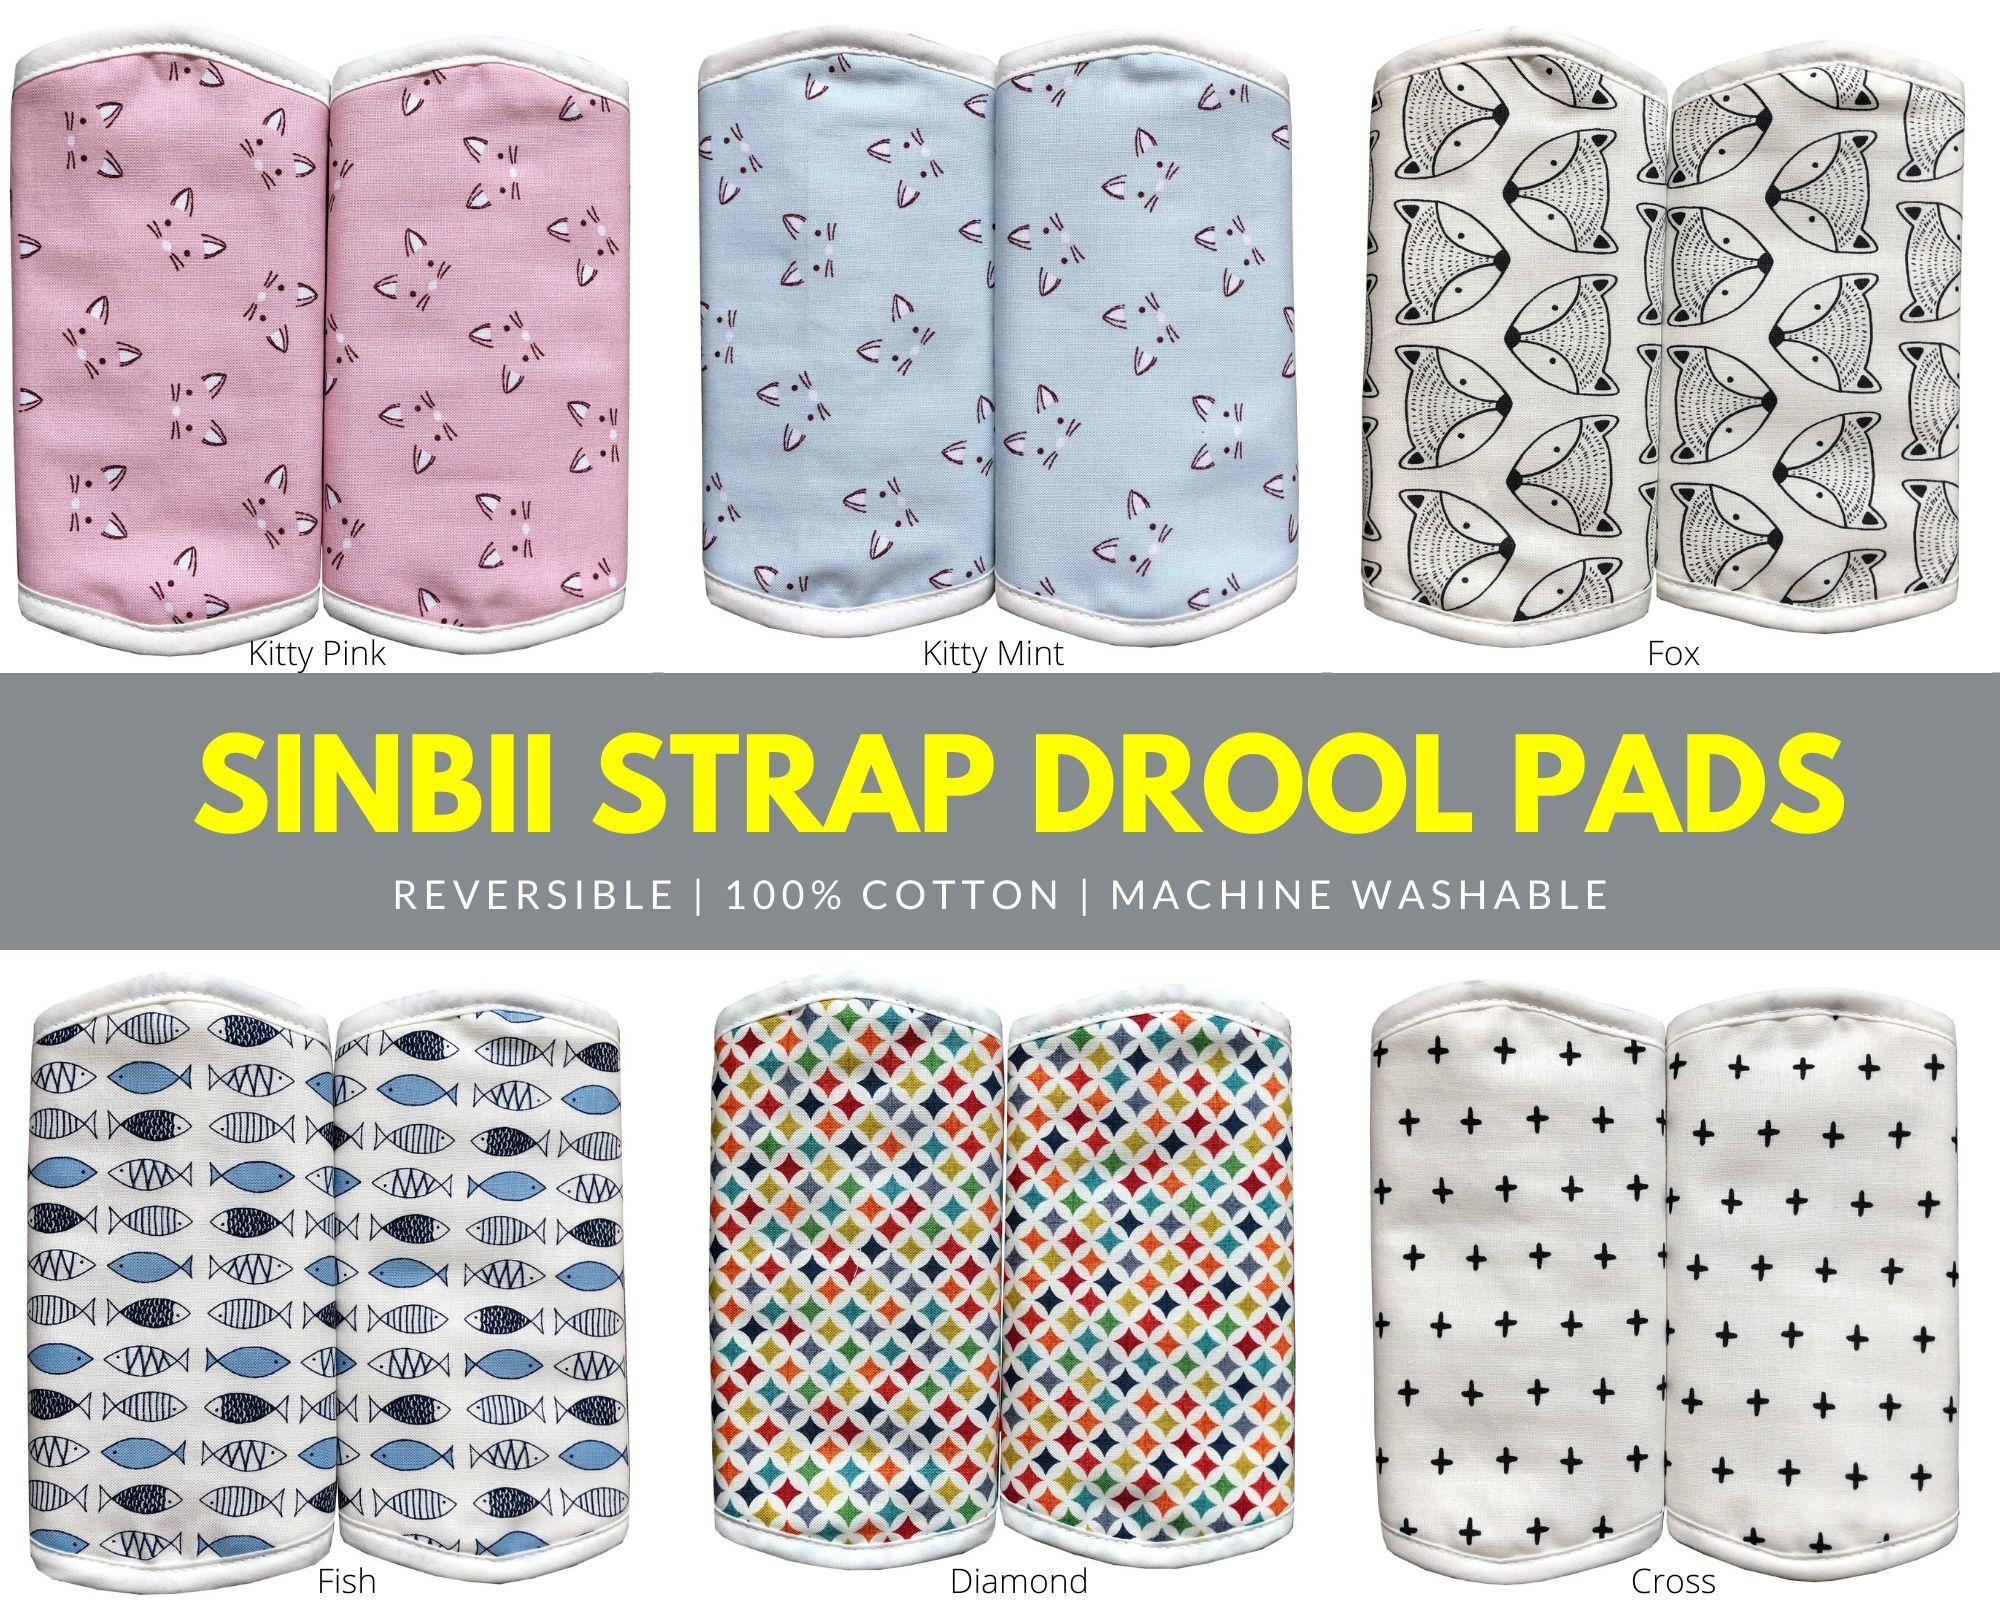 baby-fairSINBII  Straps Drool pads B